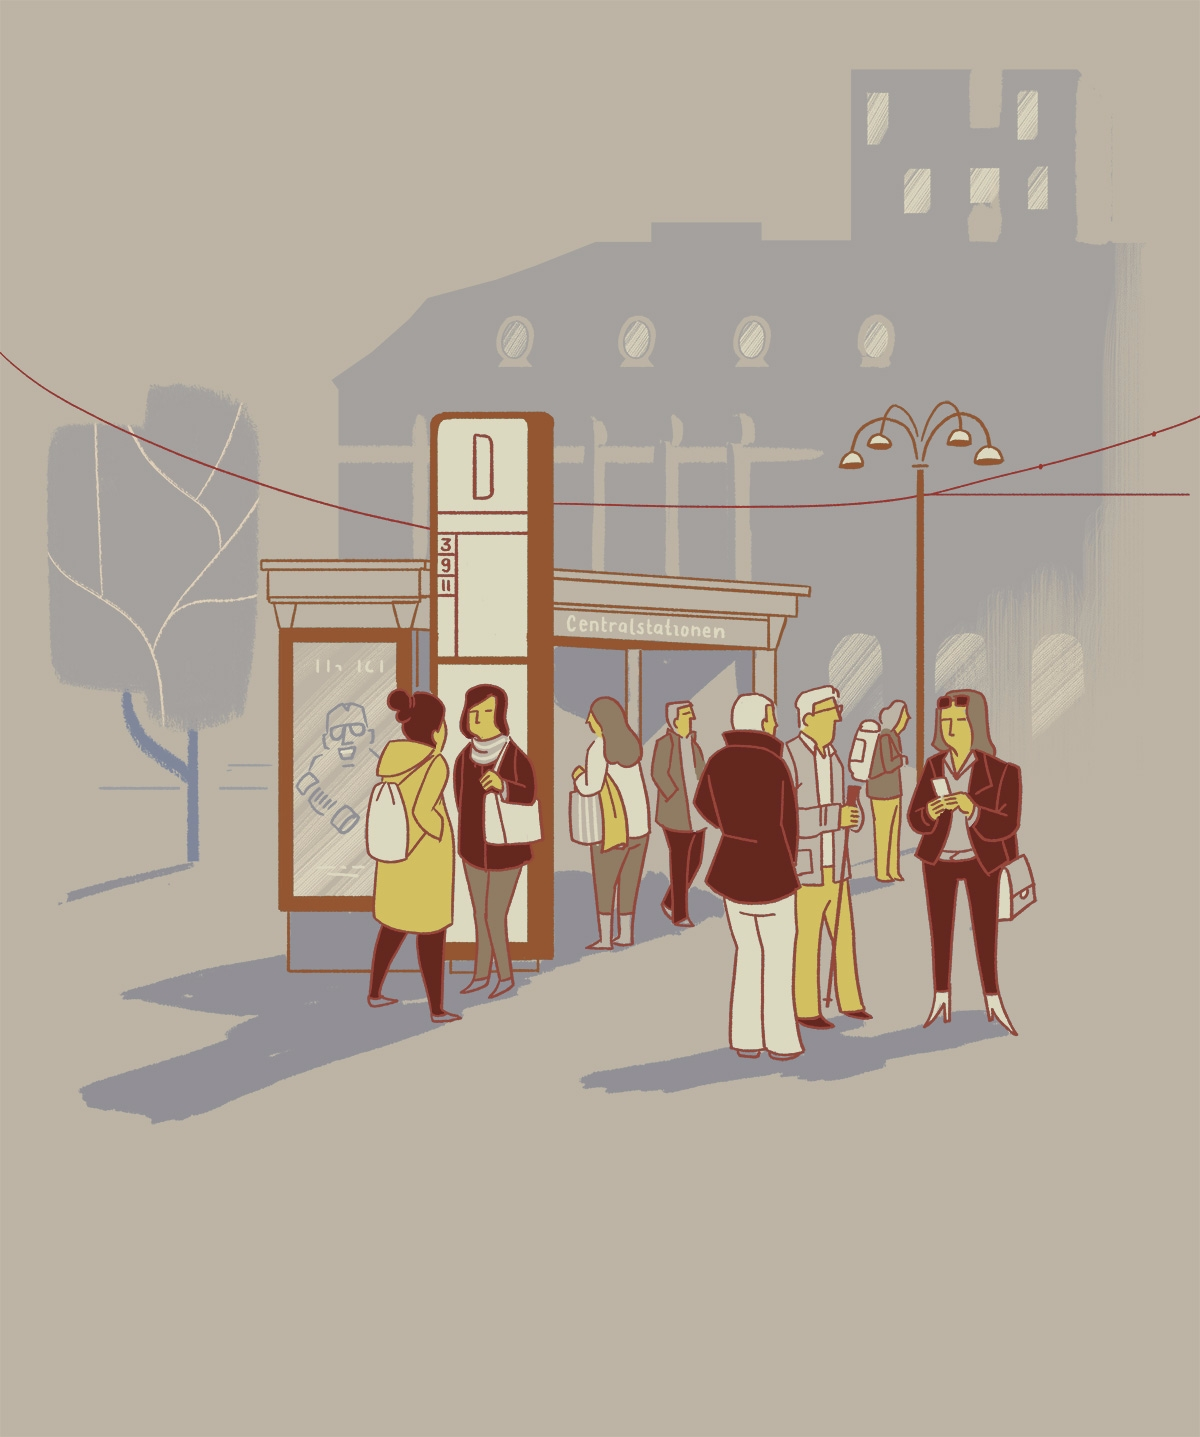 Personal sketch Gothenburg. Peo - danielspacek | ello